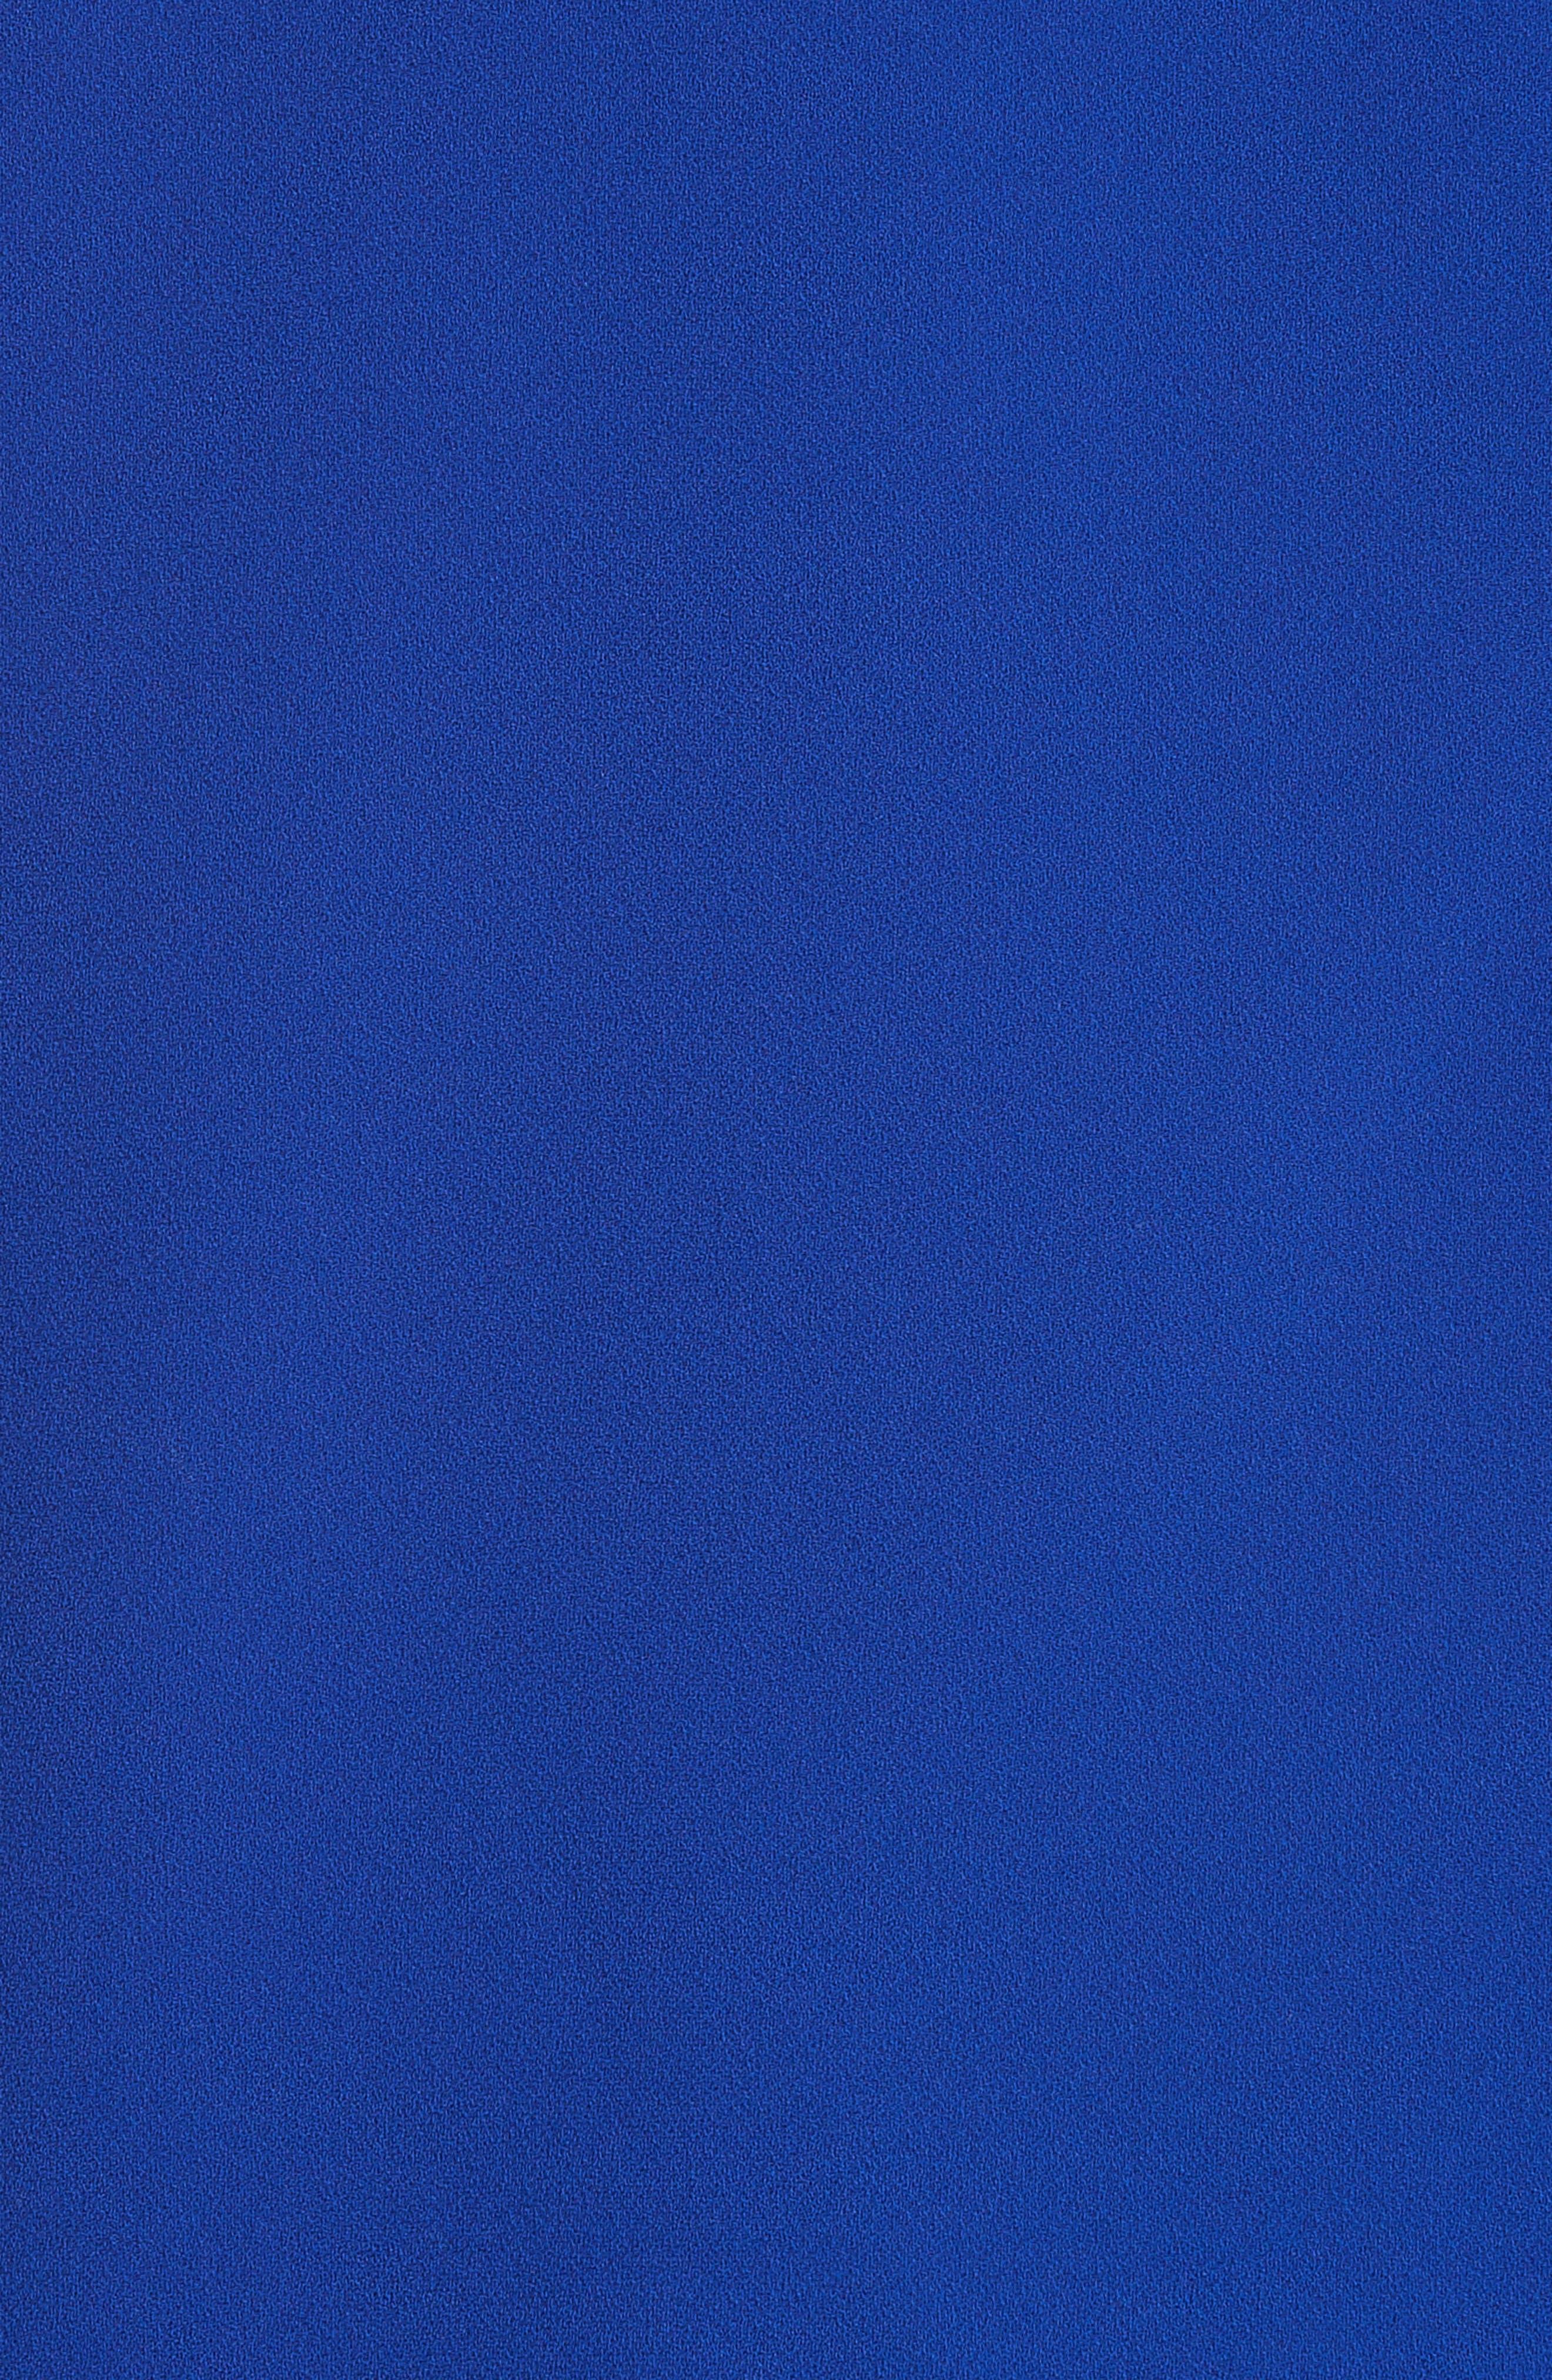 Awefa Cutout Crepe Blouse,                             Alternate thumbnail 5, color,                             Electric Blue